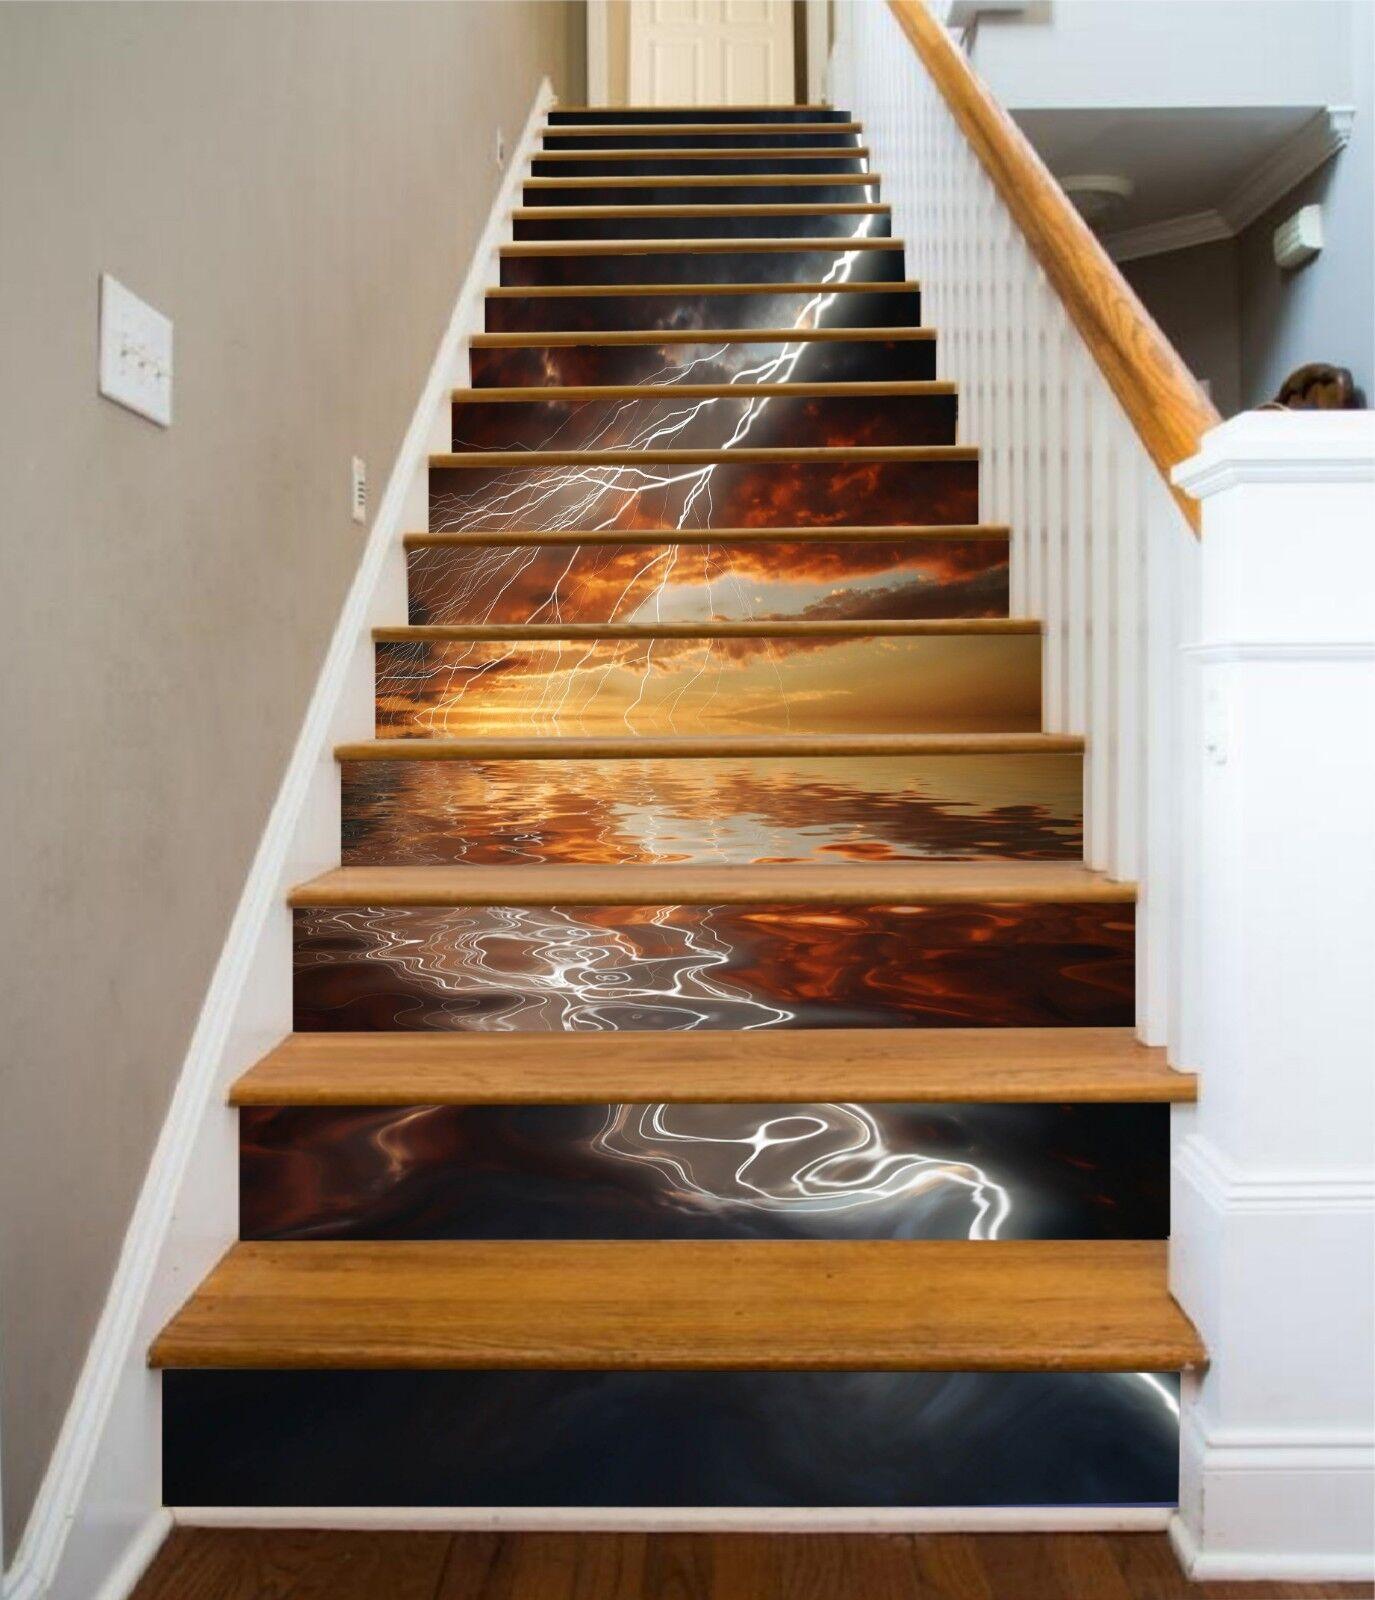 3D Lightning Sky 26 Stair Risers Decoration Photo Mural Vinyl Decal Wallpaper CA